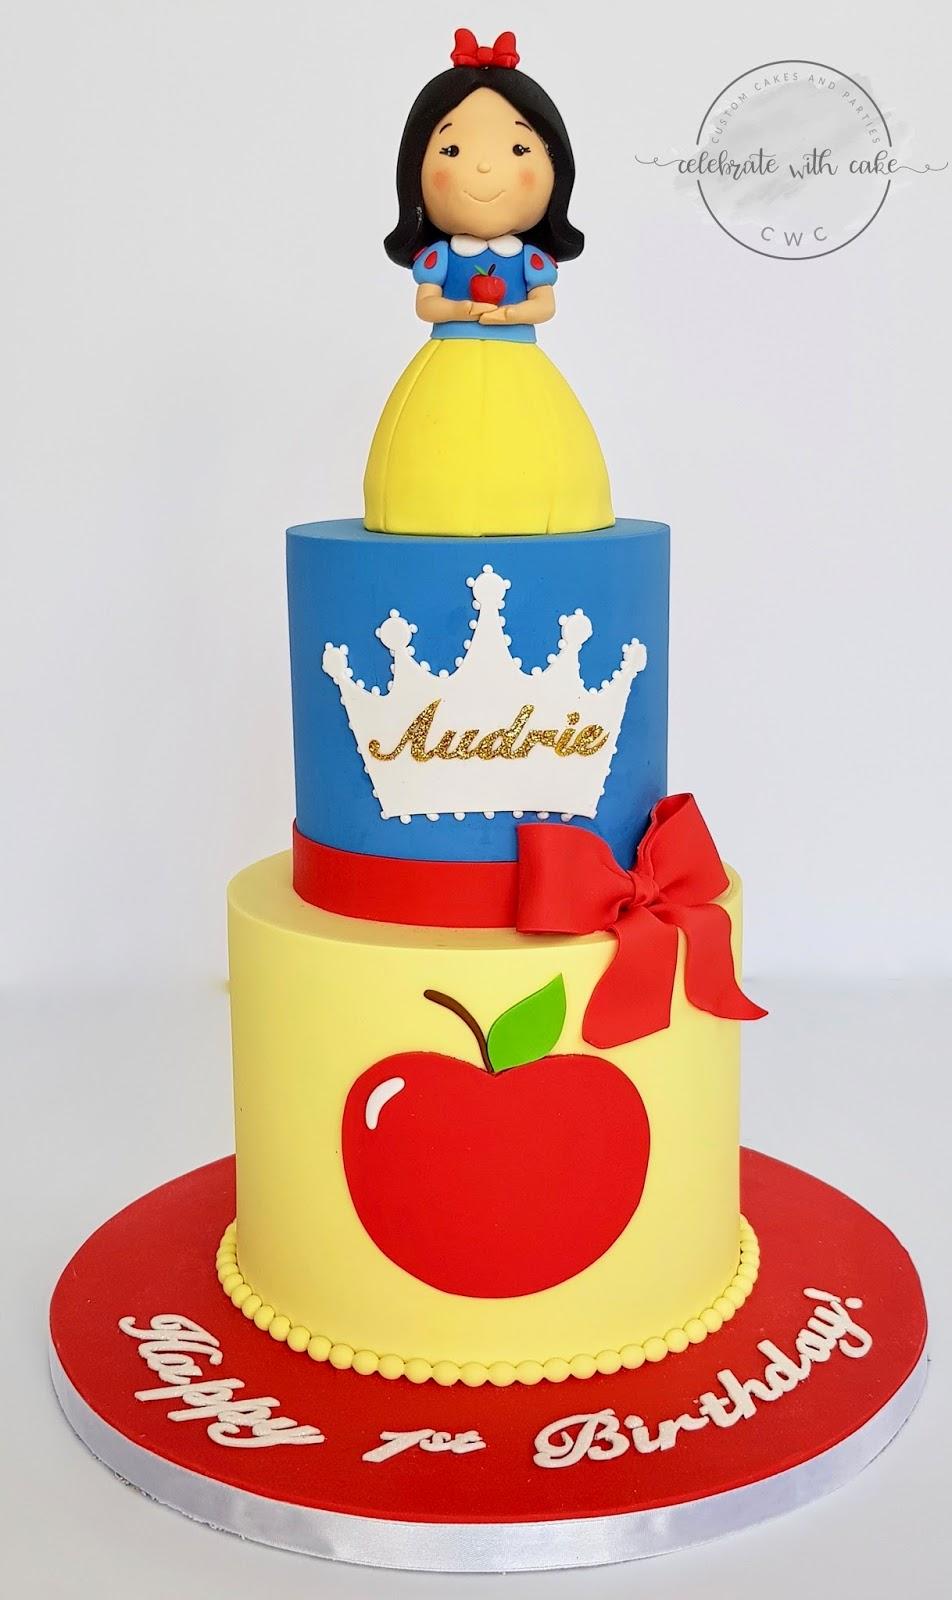 Pleasant Celebrate With Cake Snow White 1St Birthday Cake Funny Birthday Cards Online Alyptdamsfinfo